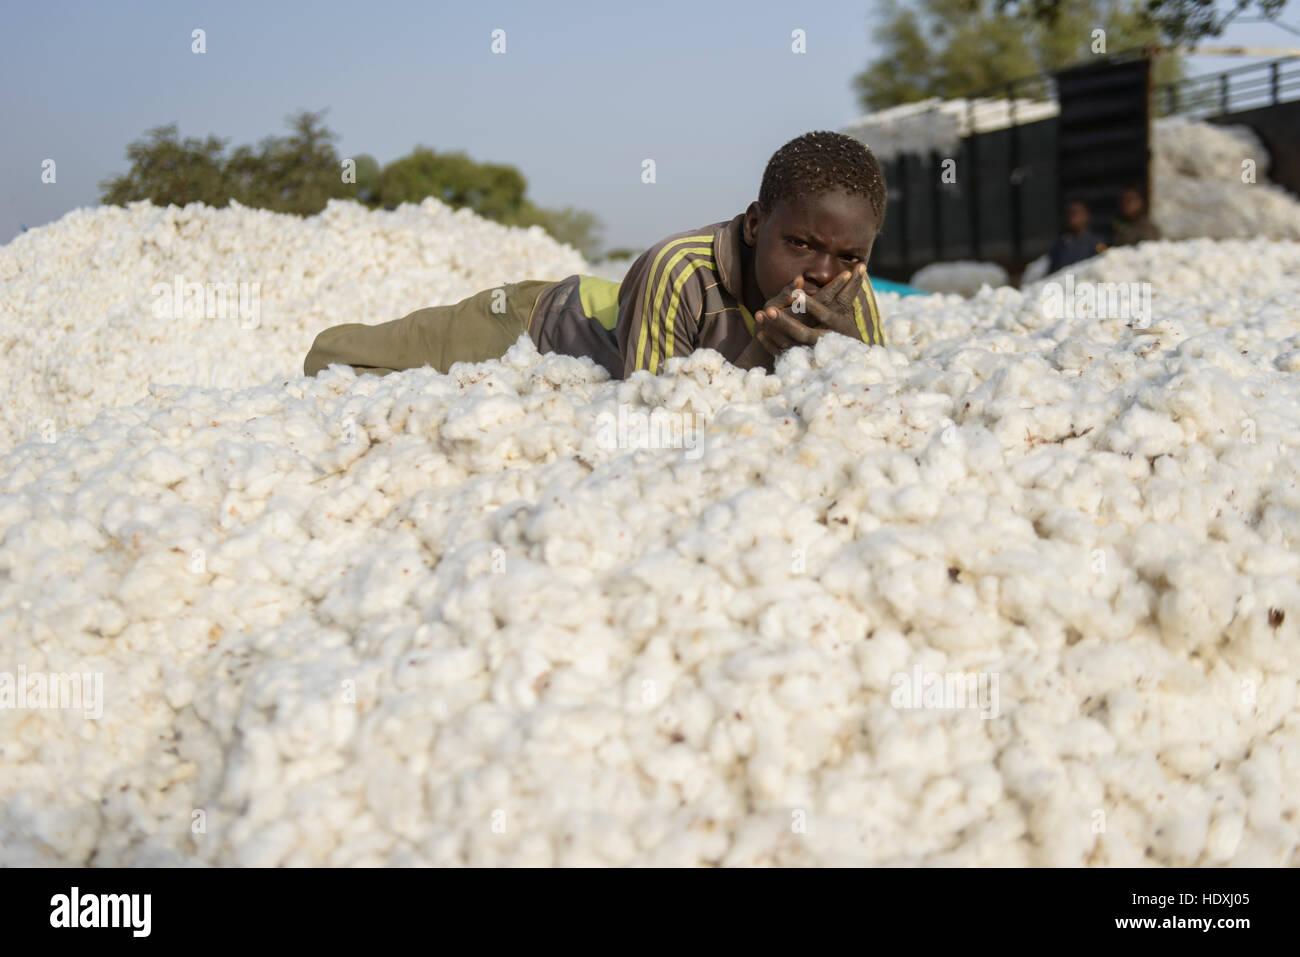 cotton recollection, Burkina Faso - Stock Image